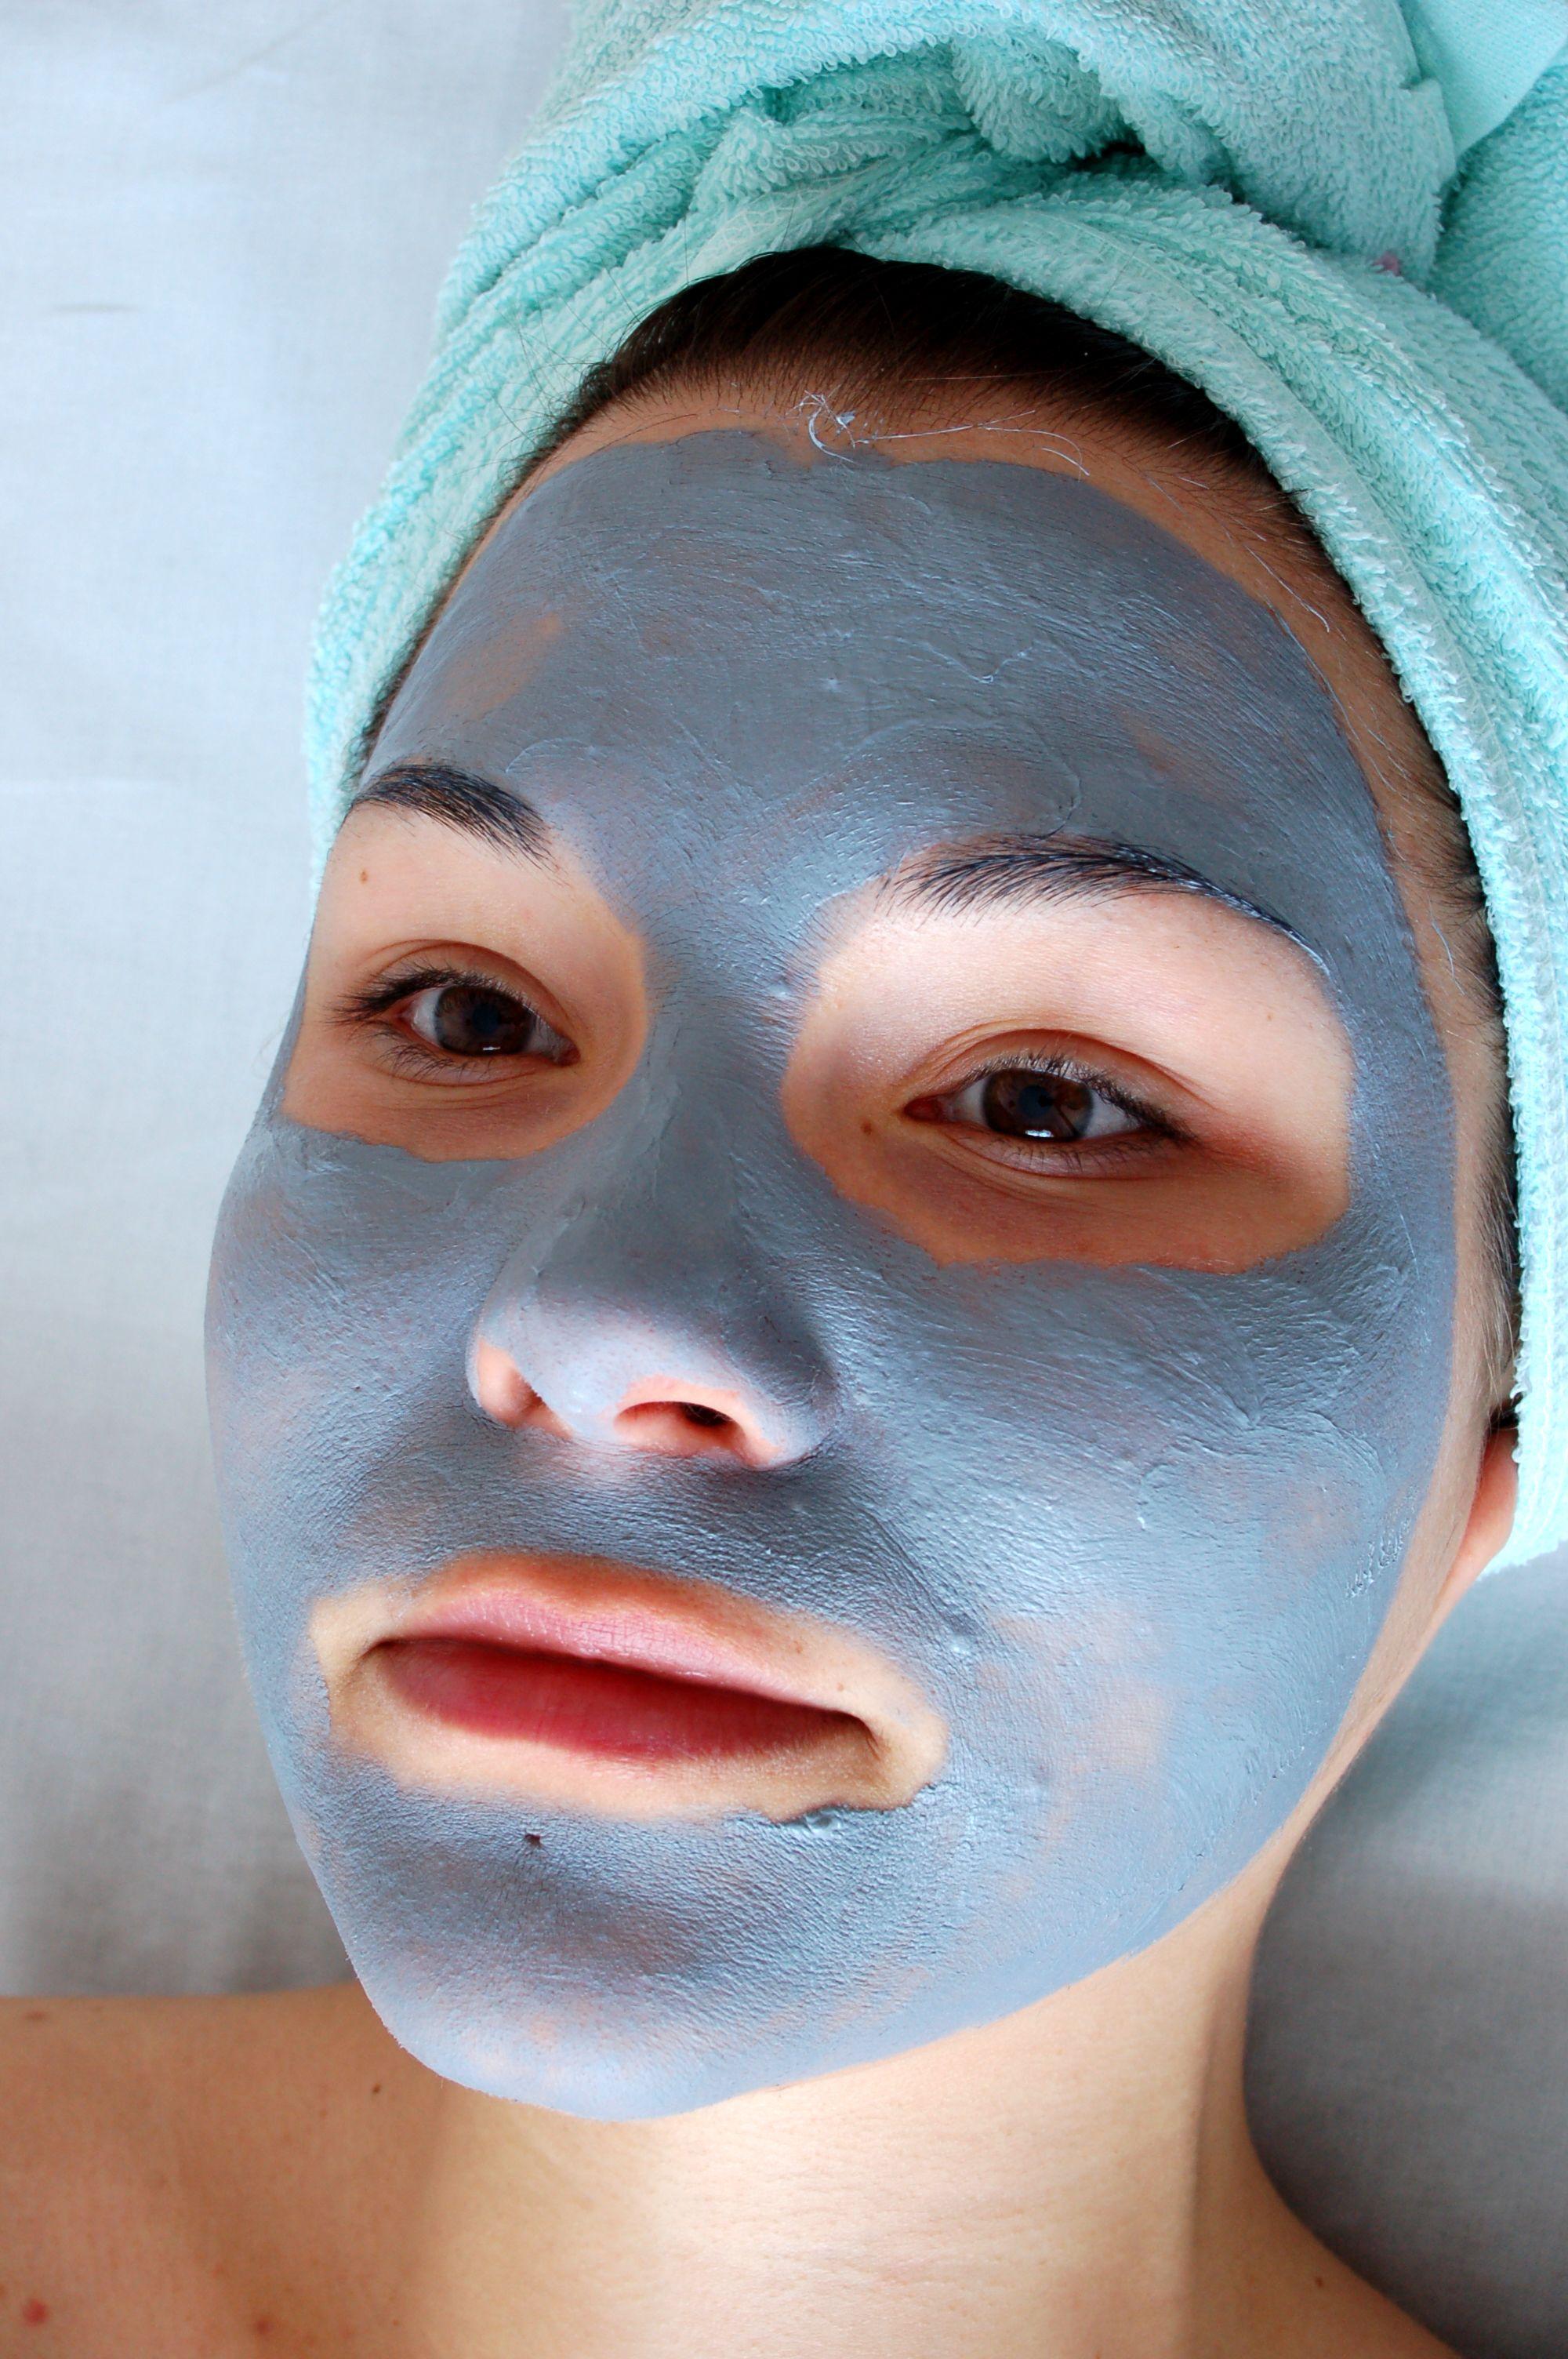 Homemade facial masks for pimples — pic 2